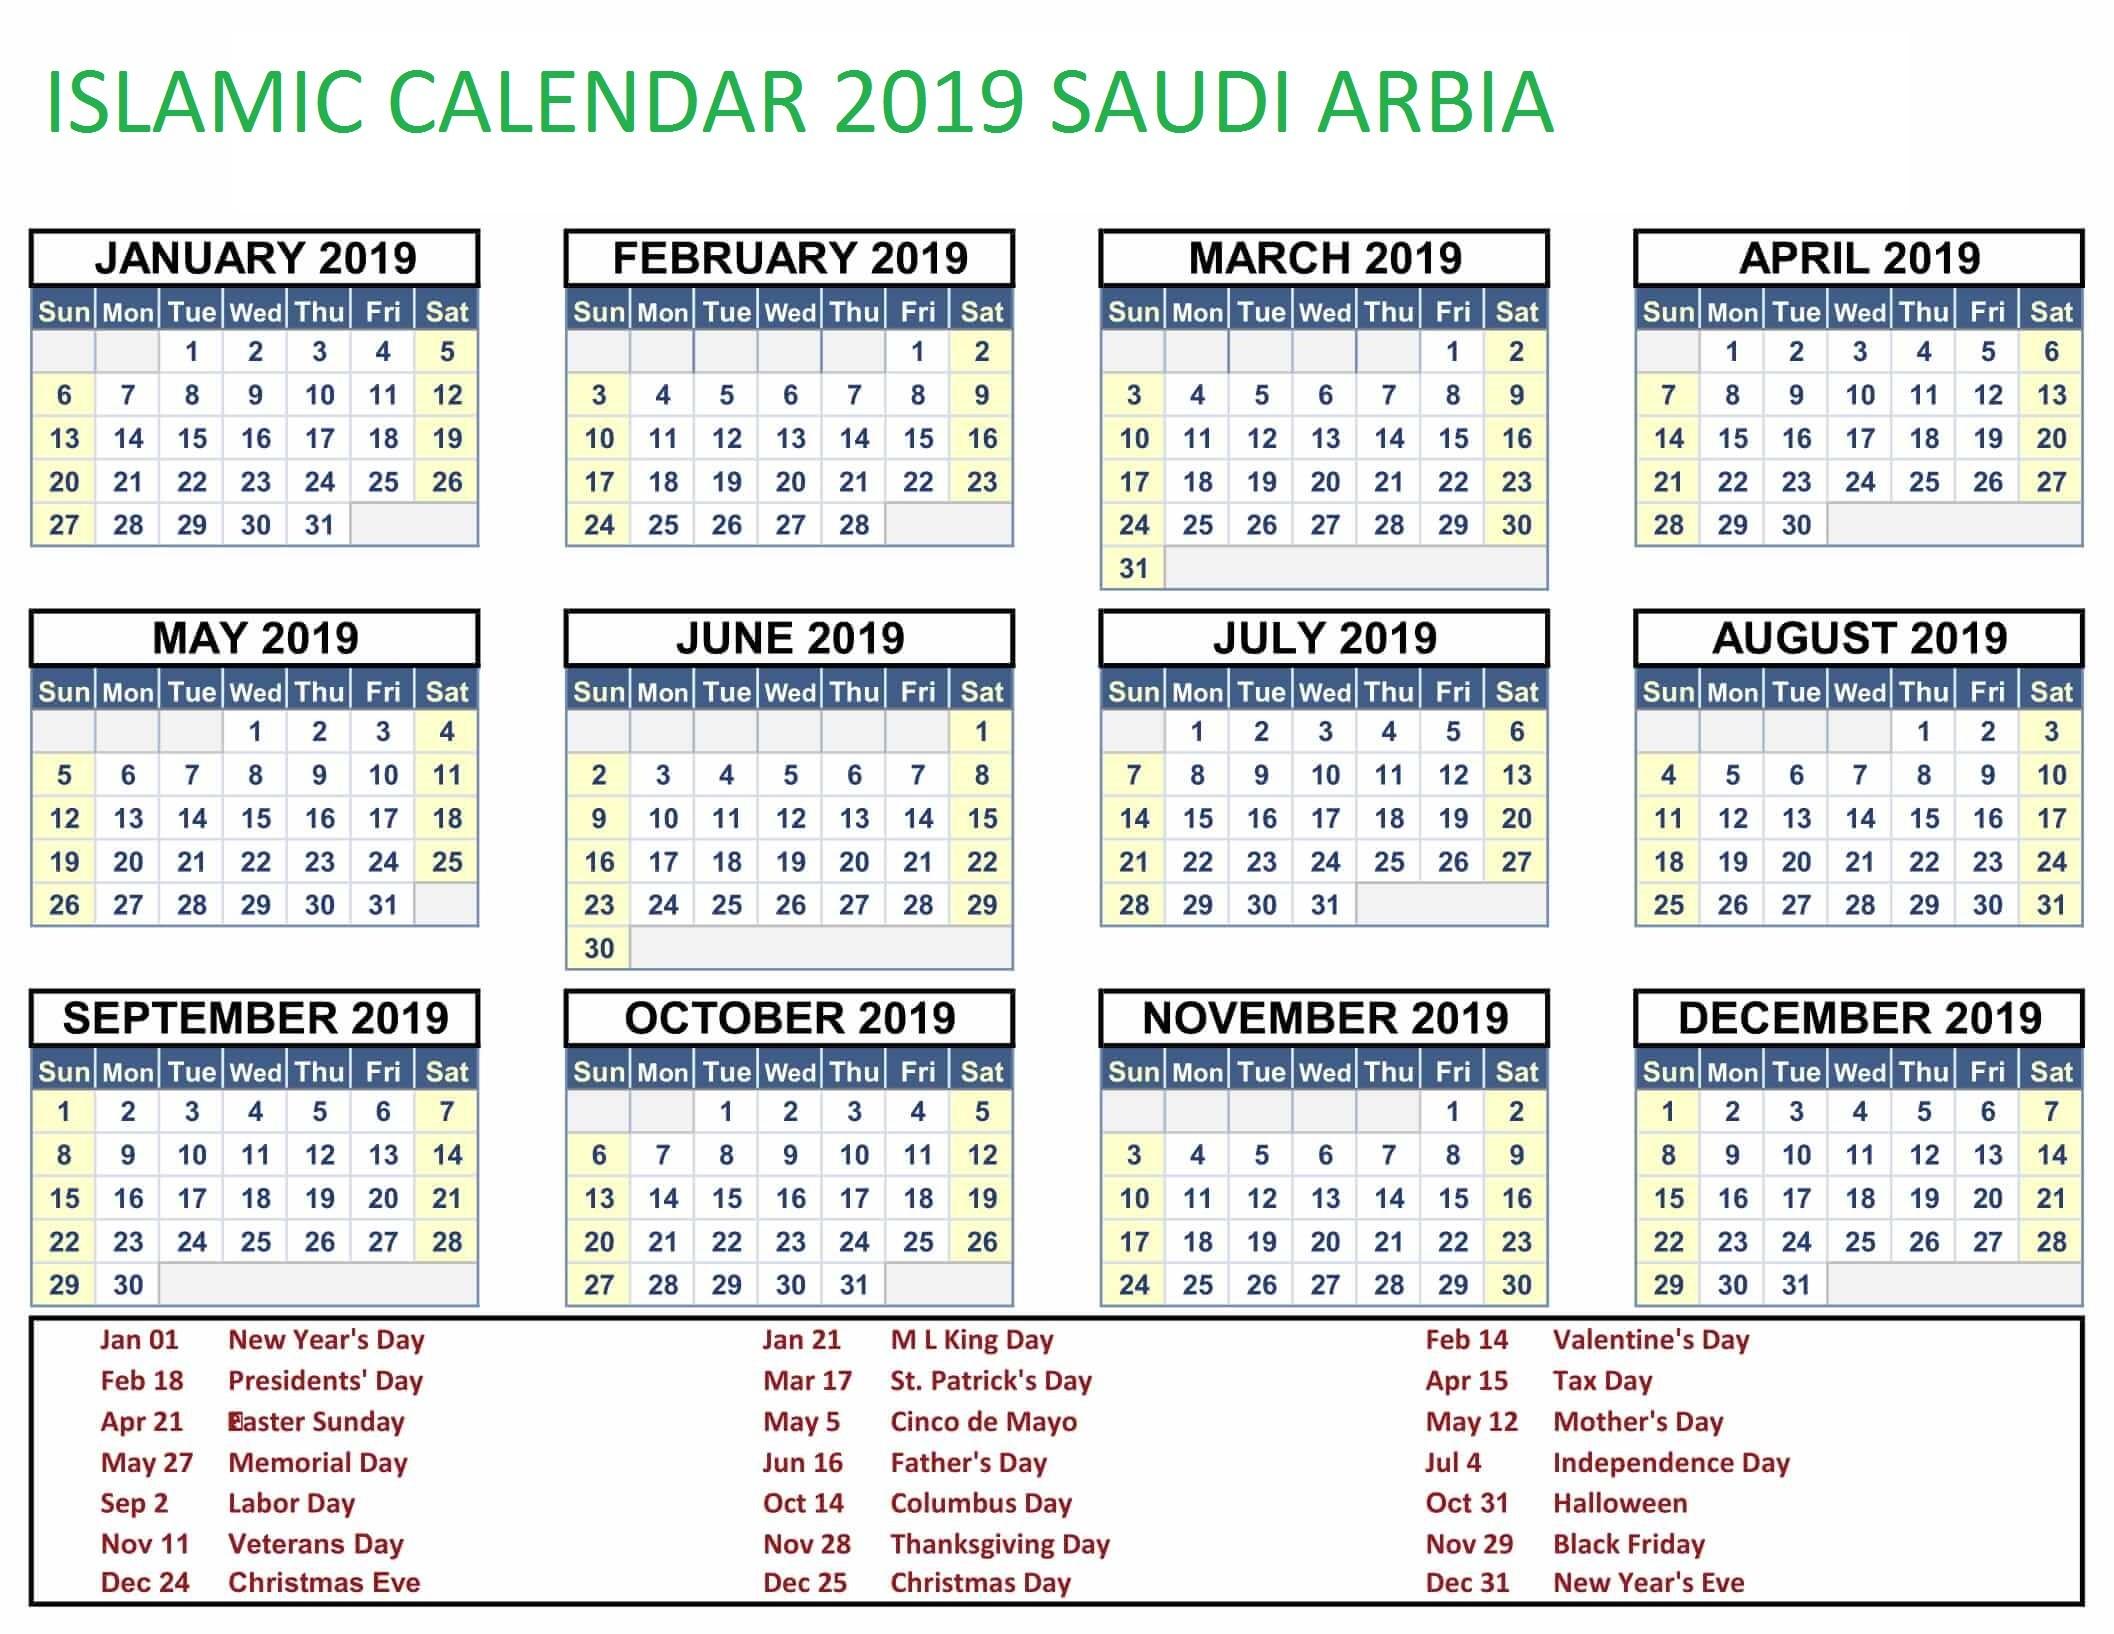 Download Kalender islam 2019 Pdf Mejores Y Más Novedosos Printable Yearly islamic Calendar 2019 Of Download Kalender islam 2019 Pdf Más Reciente Download Free Bank Holiday 2019 Usa Calendar Templates [pdf